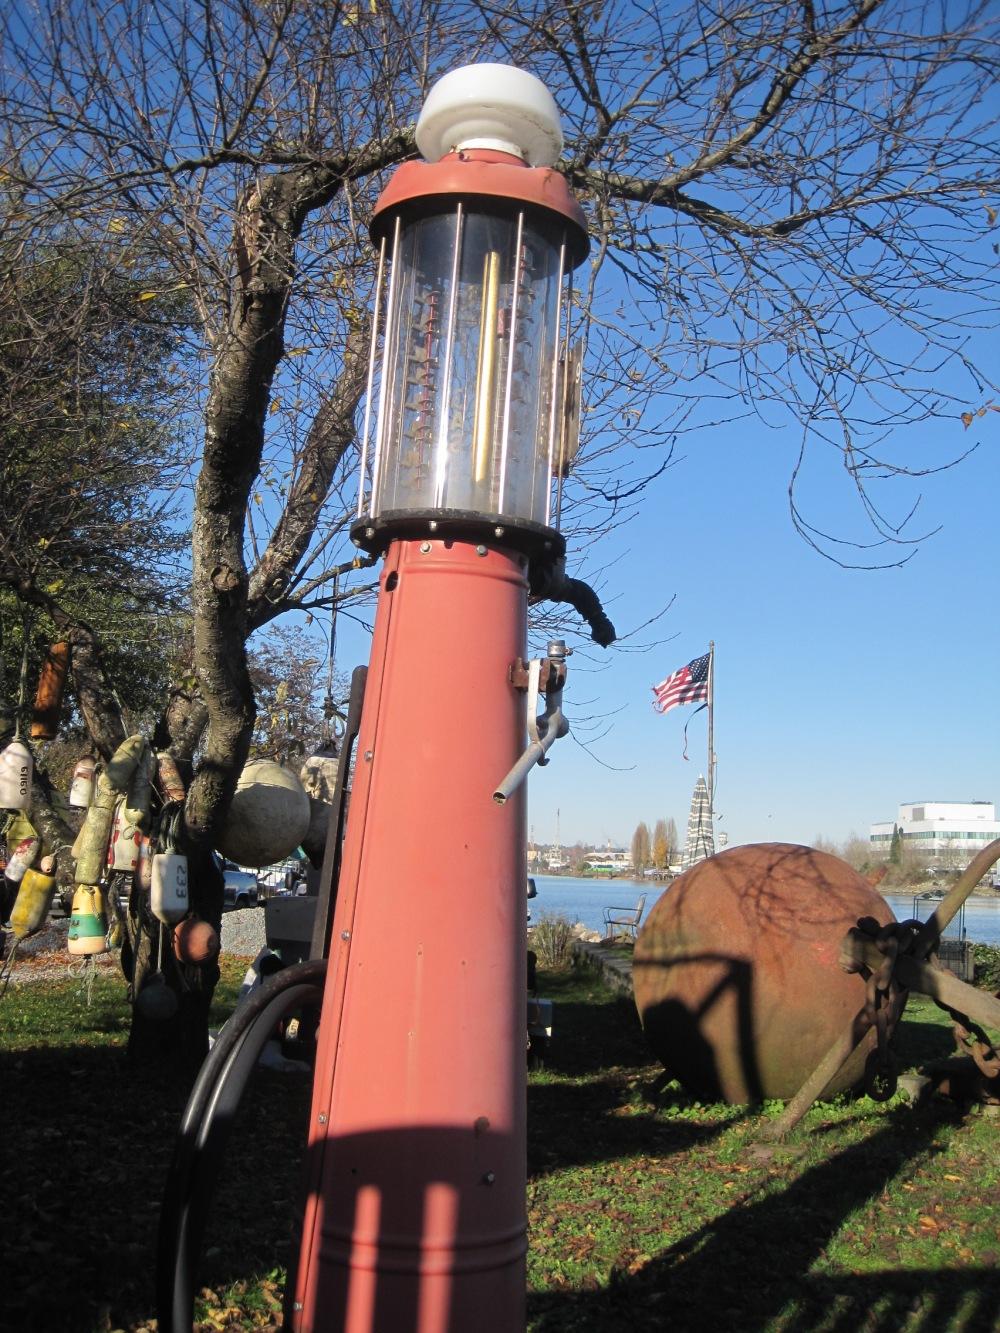 Old Gas Pump in Duwamish River back yard.